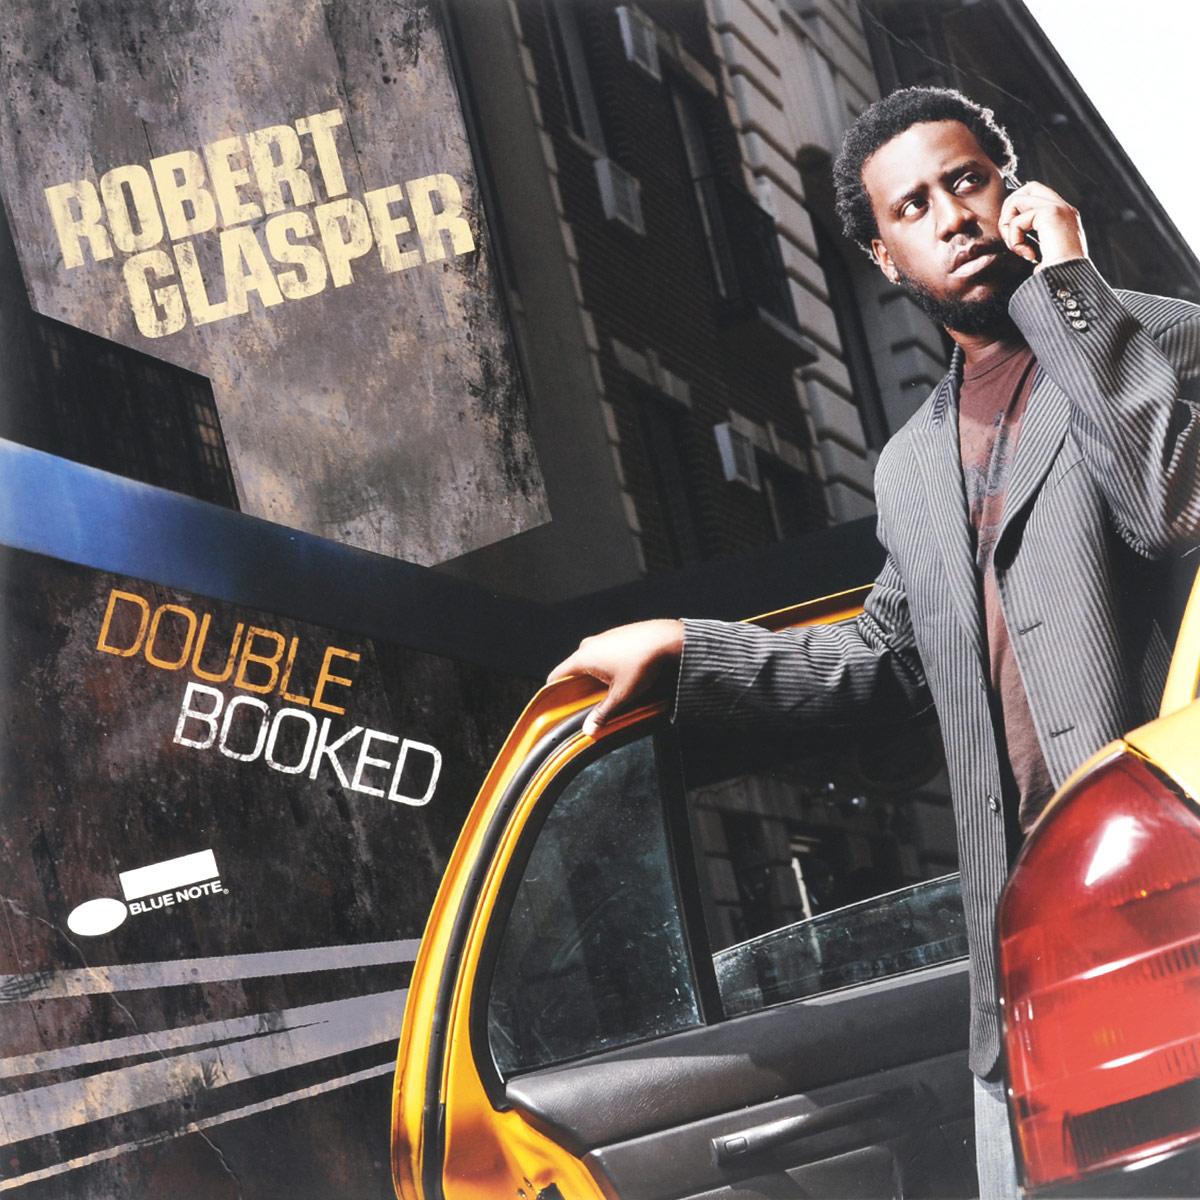 Robert Glasper Robert Glasper. Double Booked (2 LP) robert b hazelton the entropy initiative